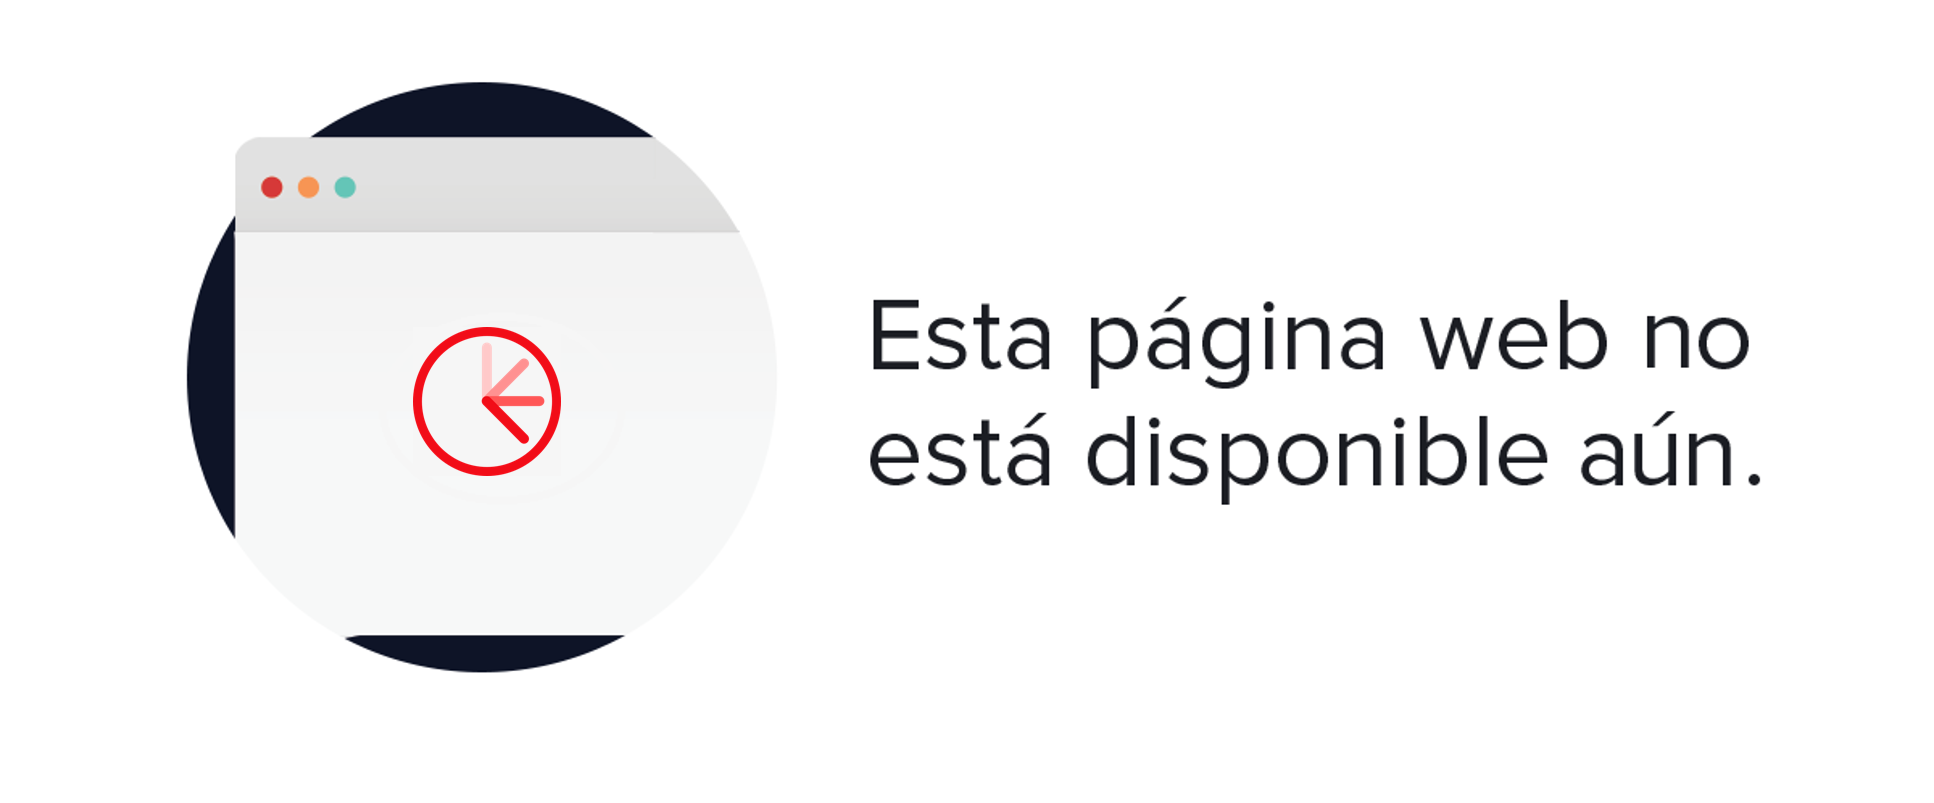 Adolfo Dominguez - Falda de mujer Adolfo Domínguez midi azul de poliéster Azul 8433917496246 - QJMTRZL